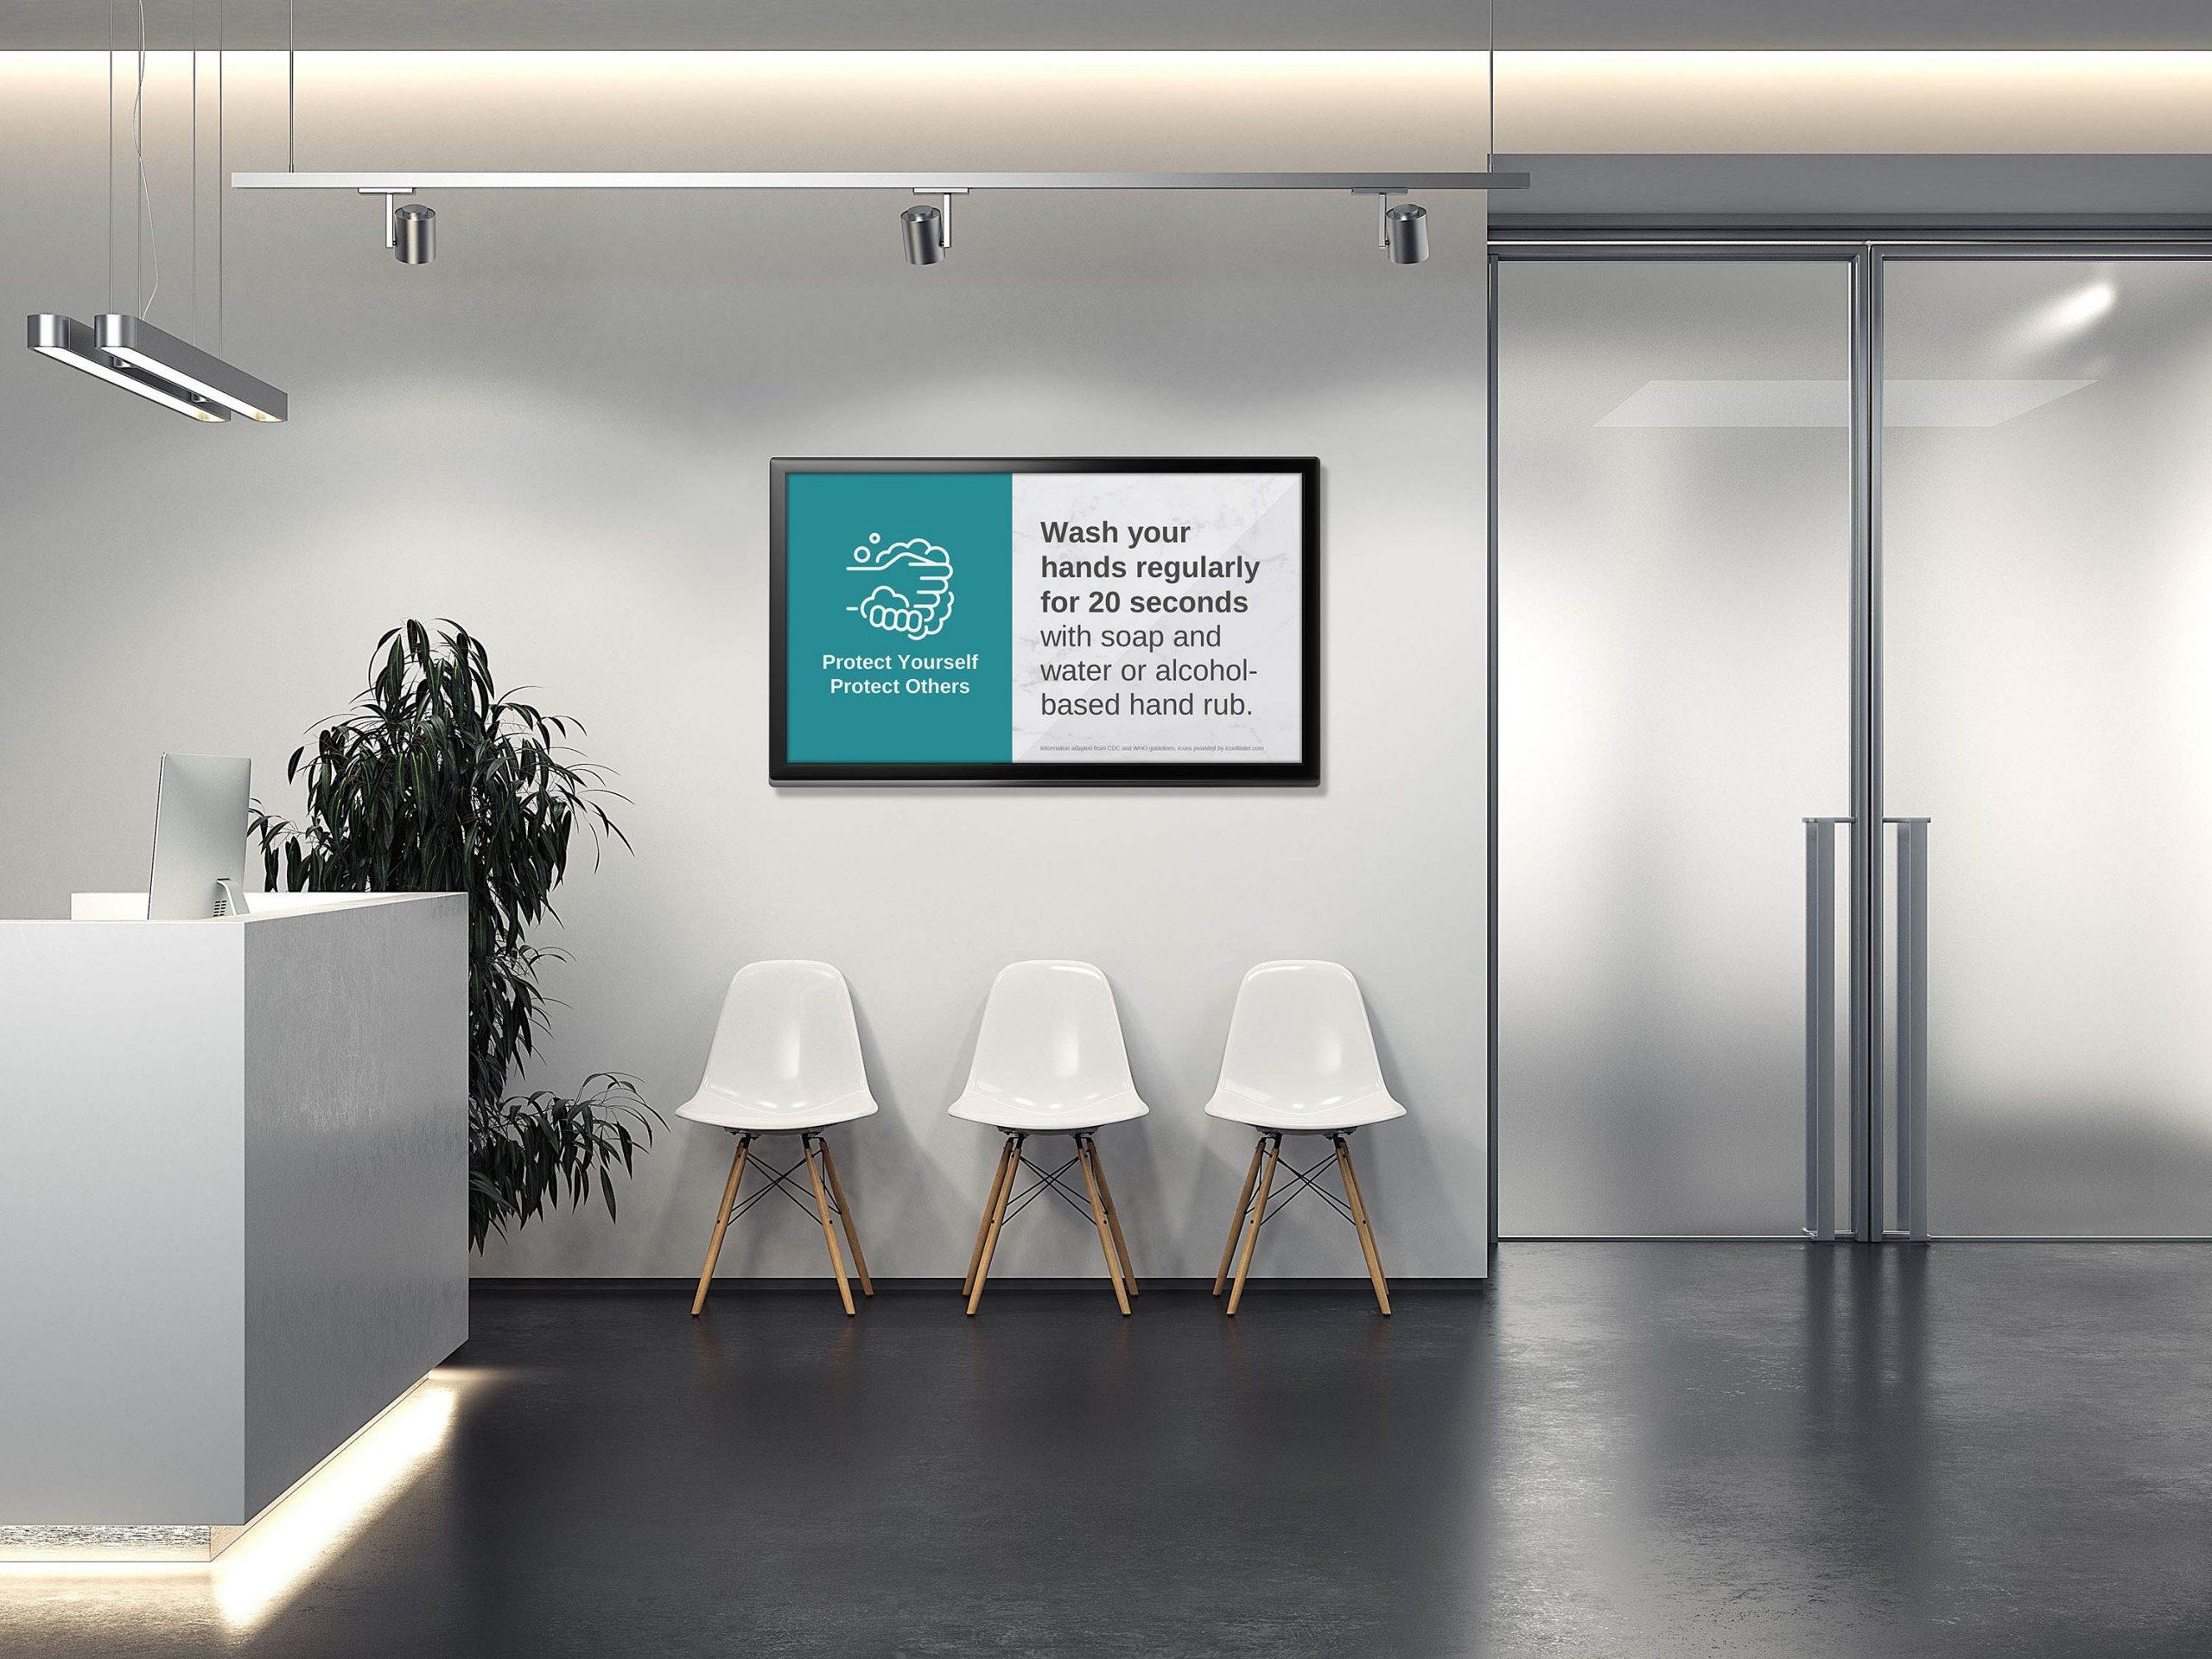 Carousel digital signage